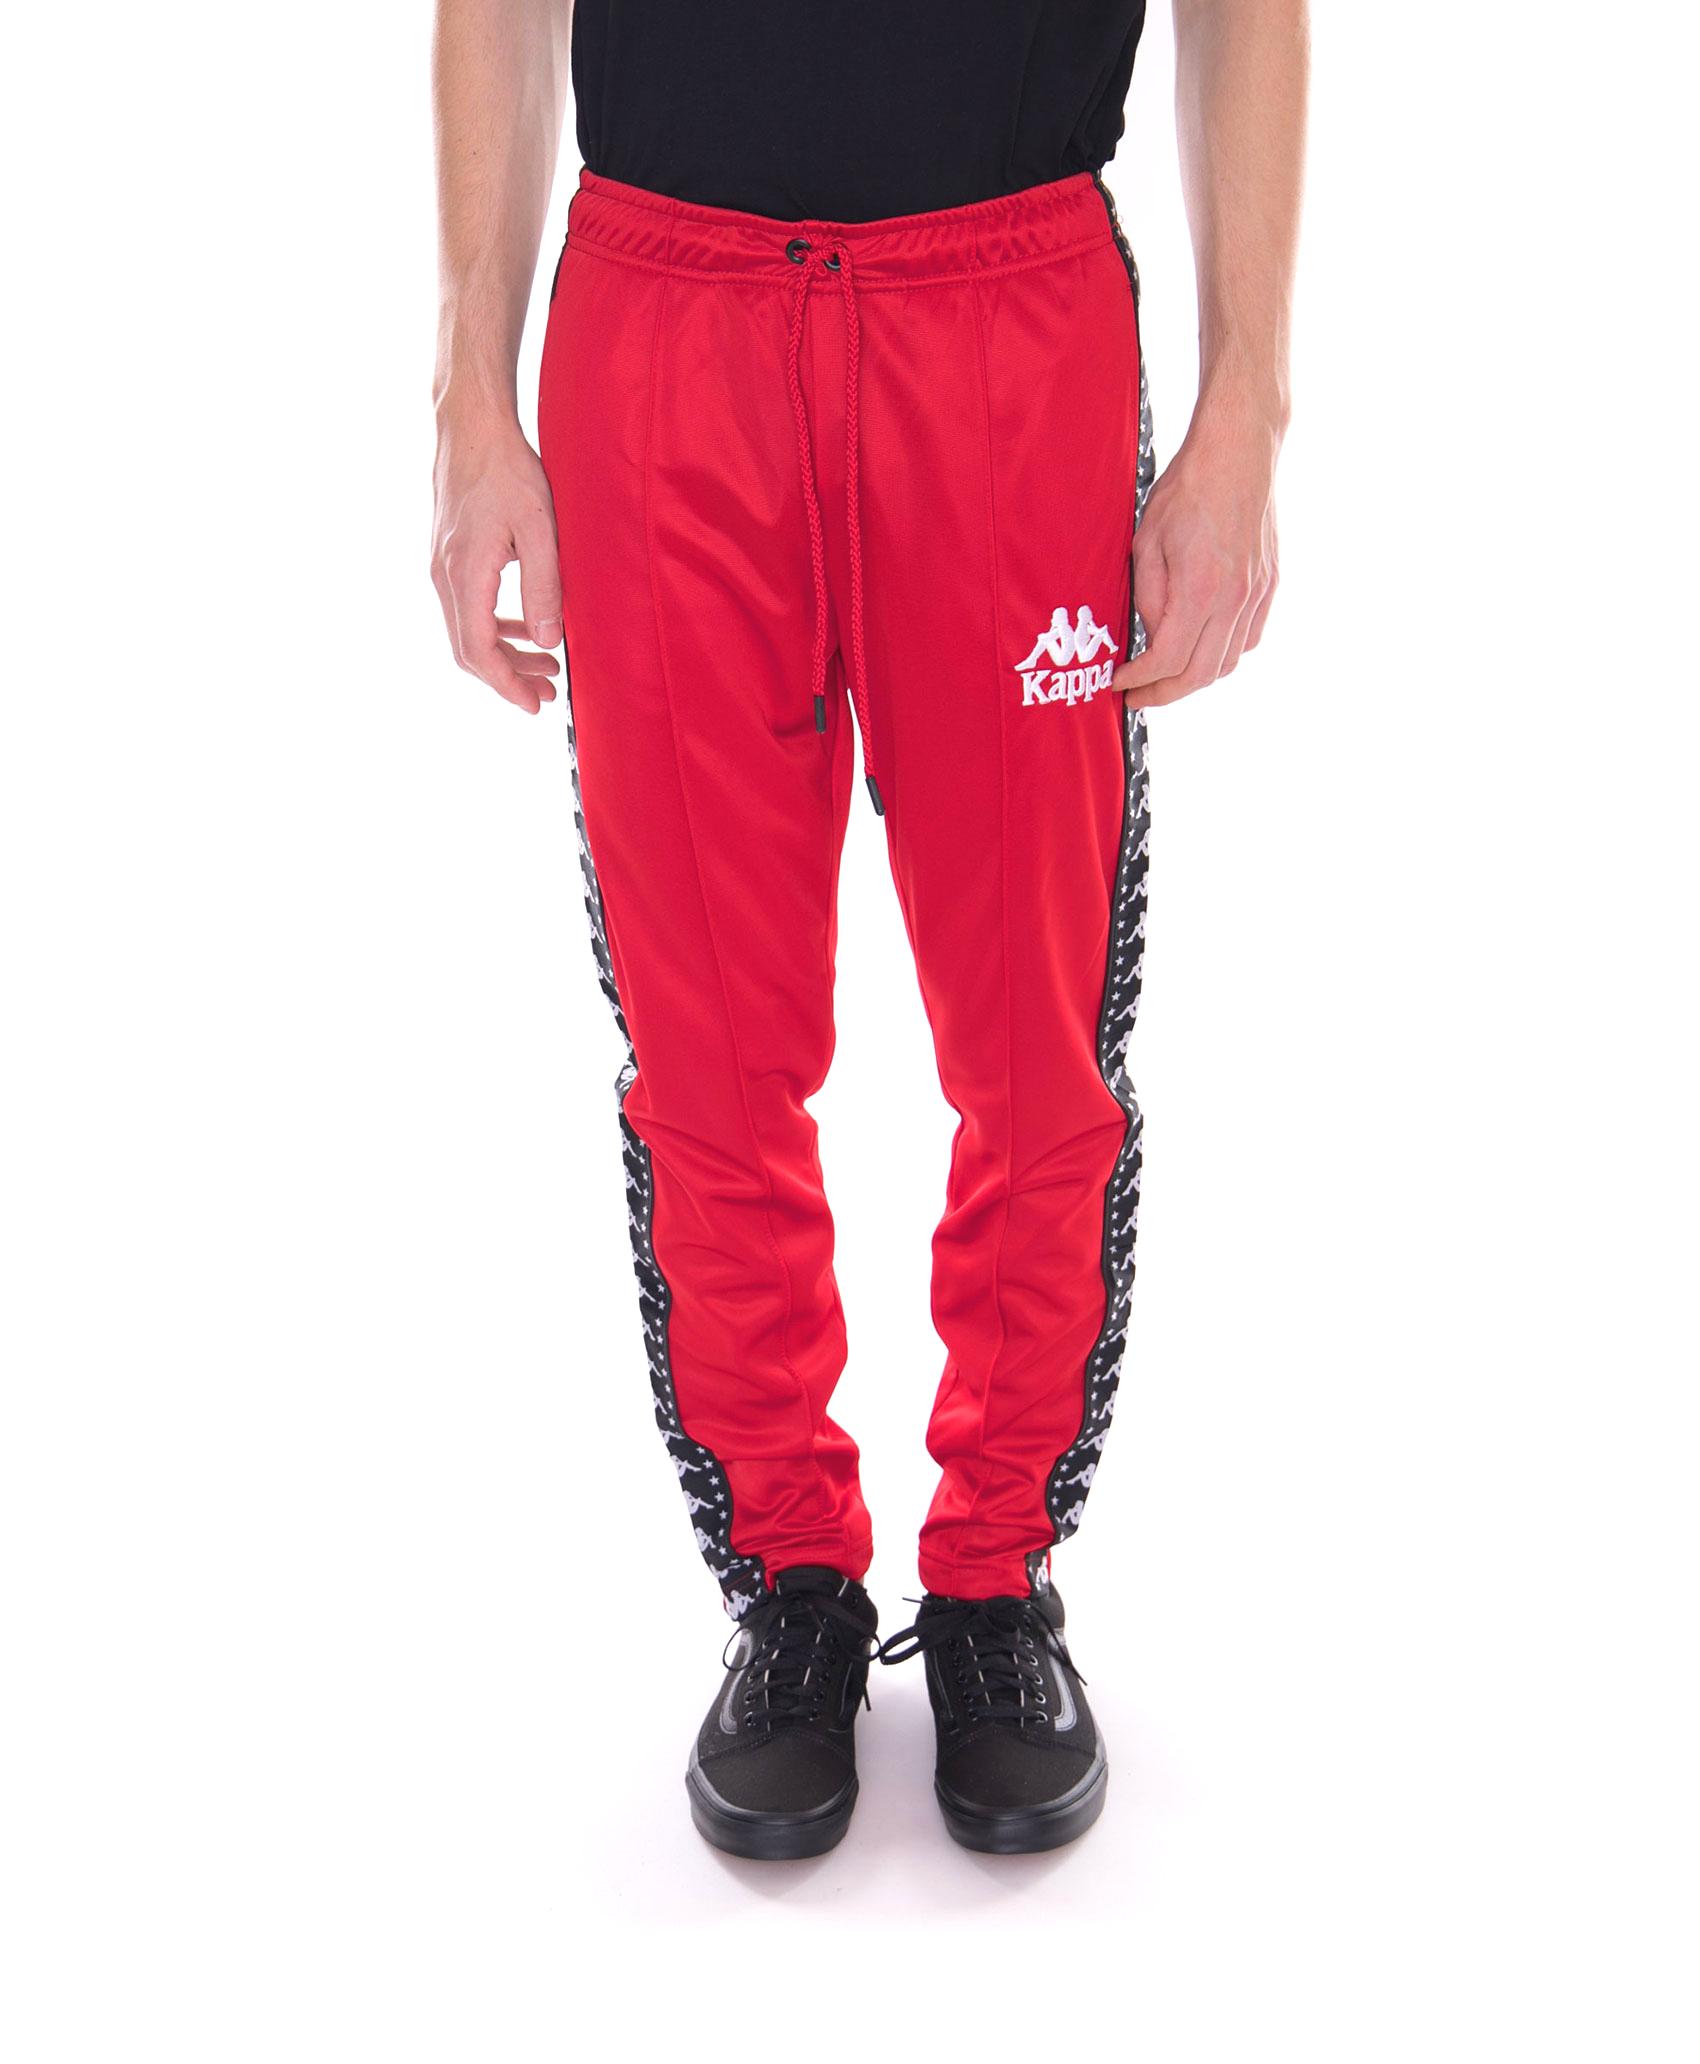 Authentic Anac Pantaloni Kappa black white Rosso Red a5nwx